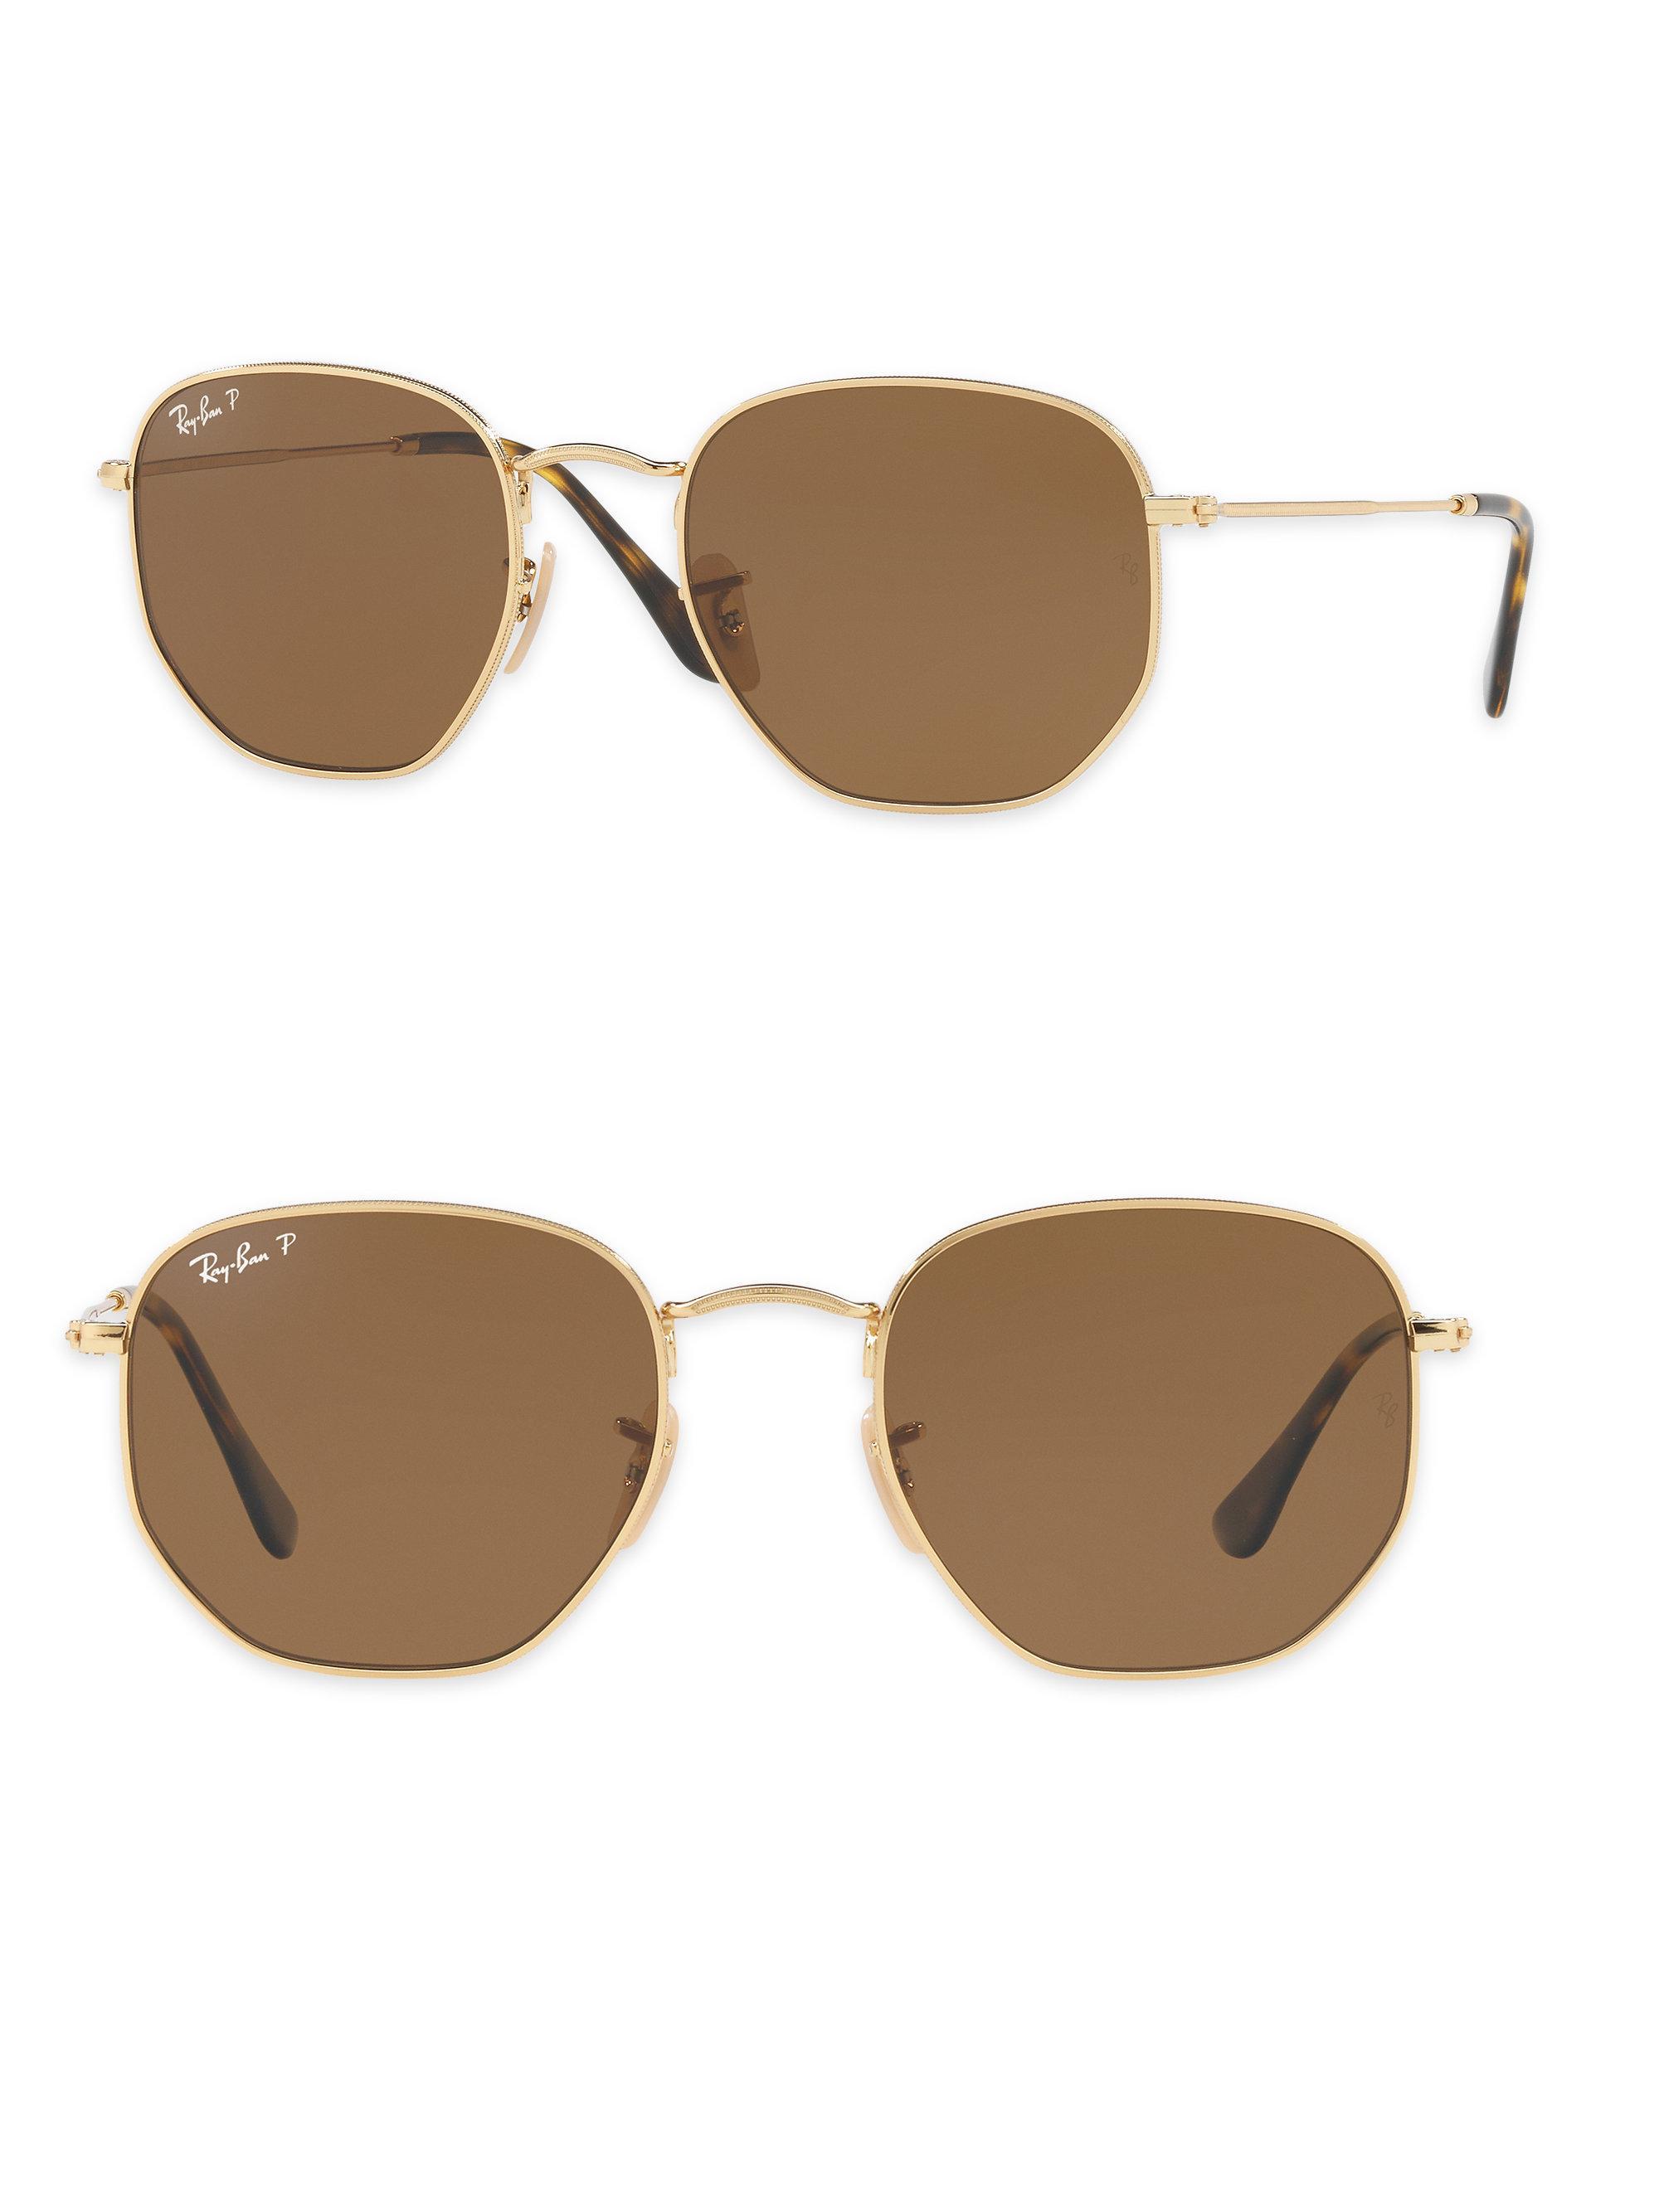 0dd19ae171a ... new zealand ray ban hexagonal sunglasses in metallic lyst d83d2 7fb6f  buy ray ban 0rb3548n hexagonal flat lenses gold sun ...